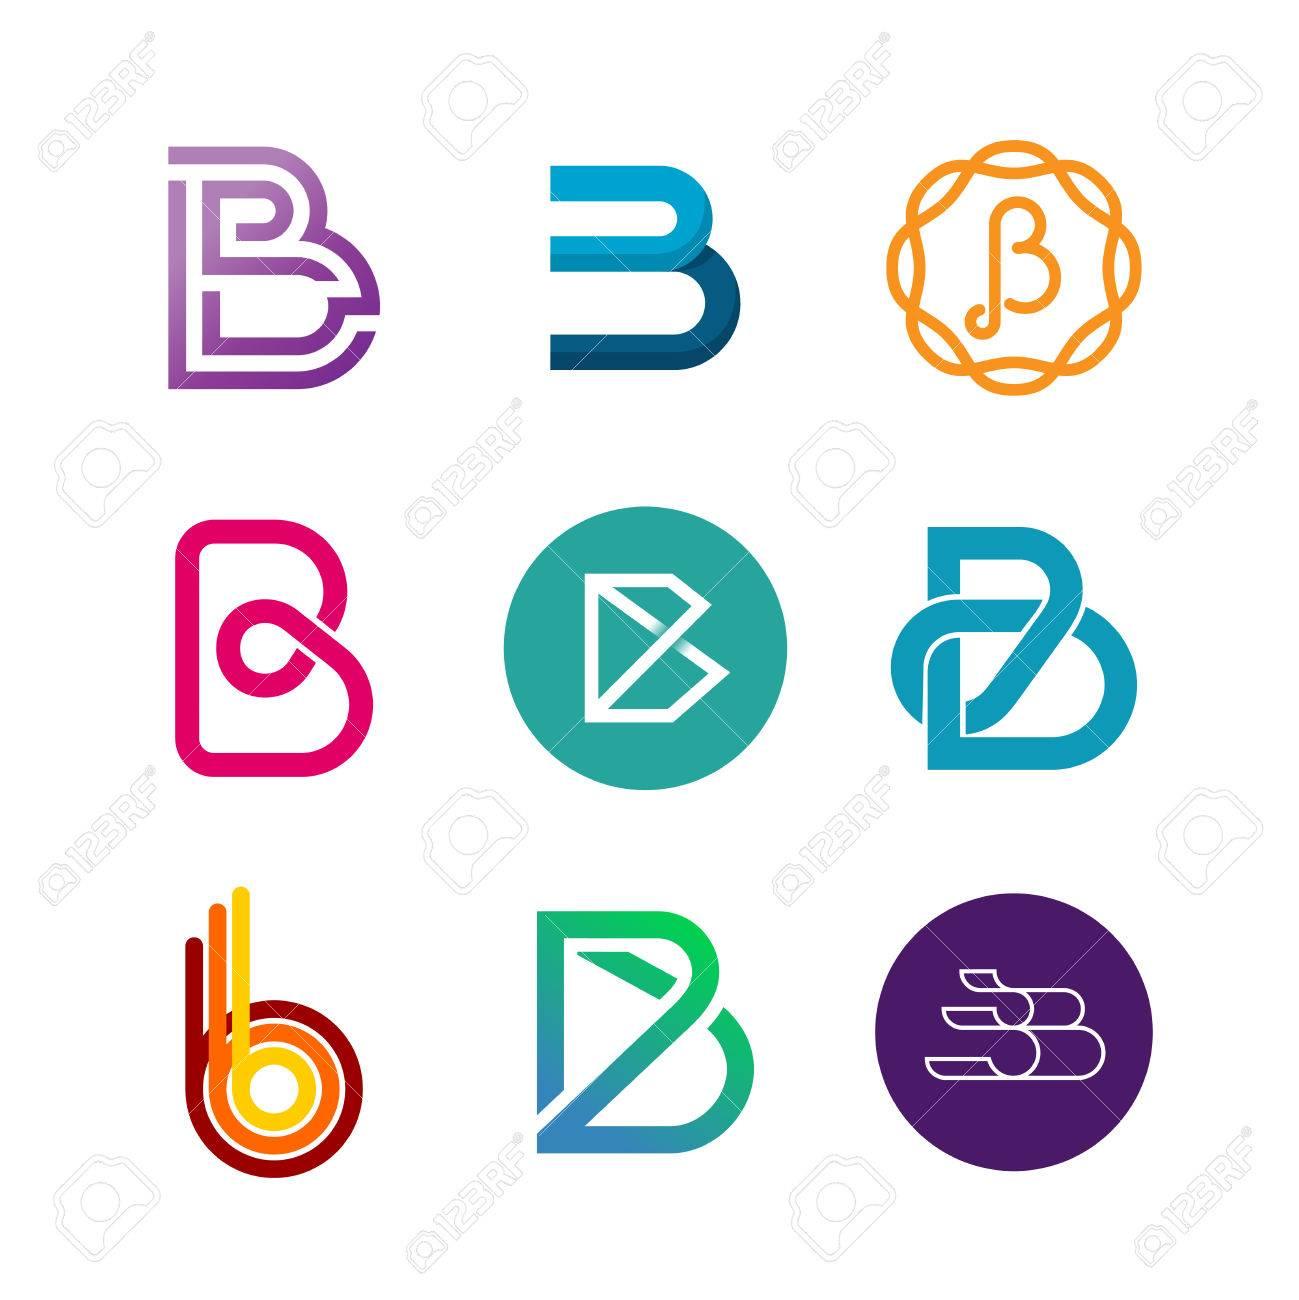 Letter B Logo Set. Color Icon Templates Design. Stock Photo, Picture ...